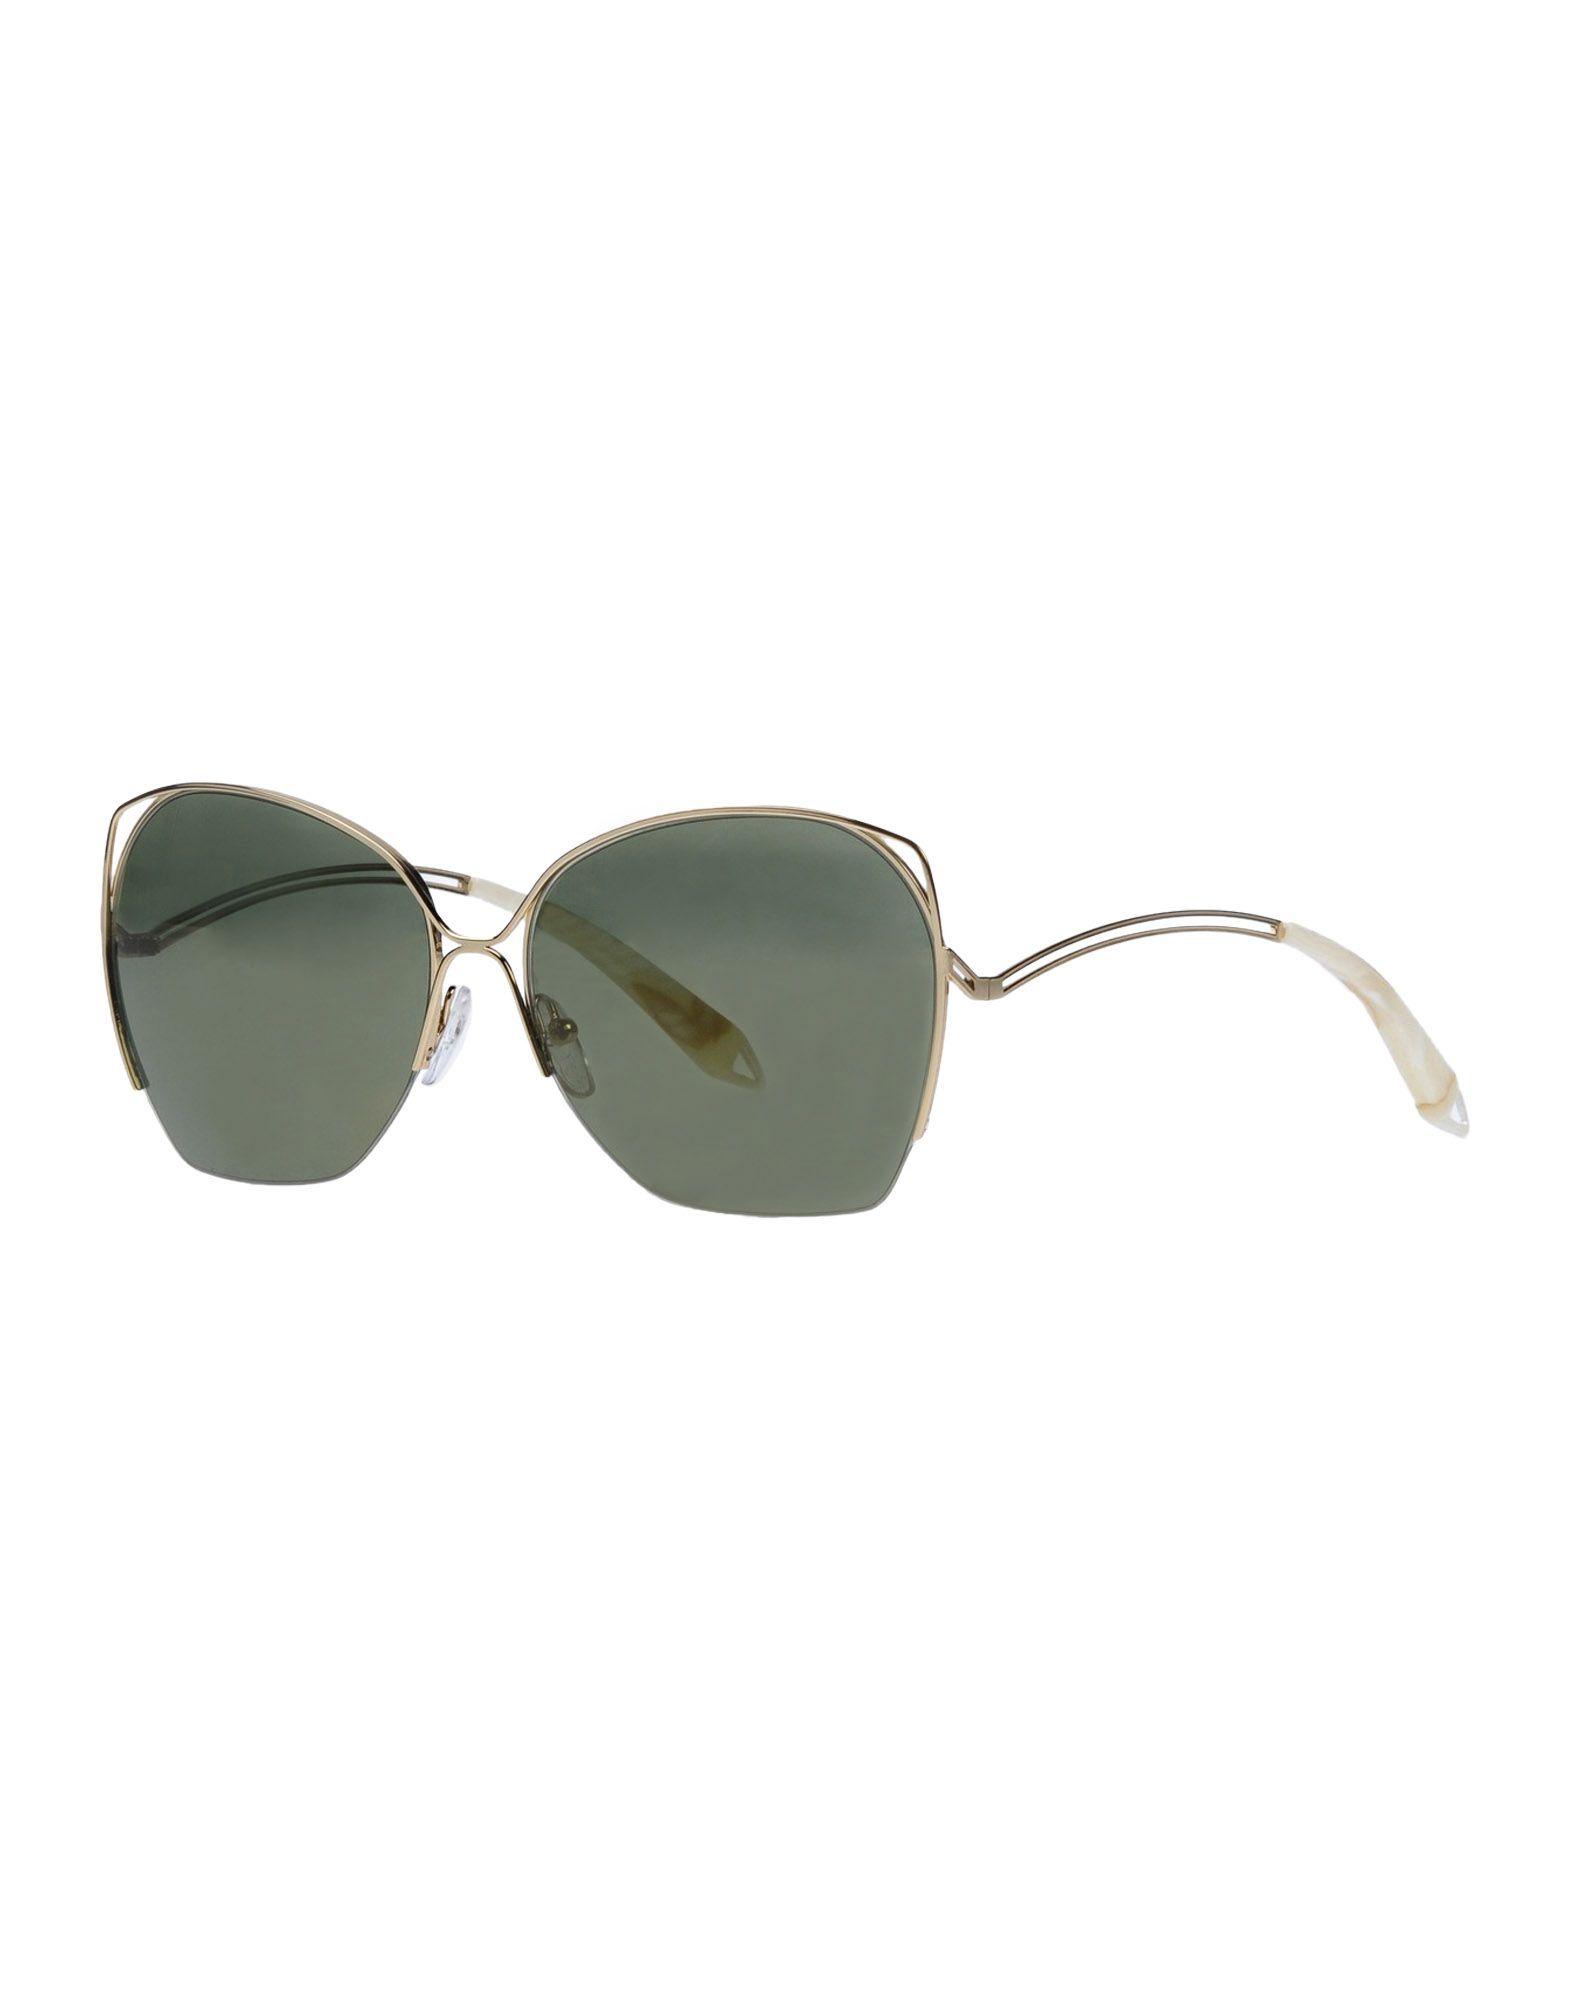 VICTORIA BECKHAM Солнечные очки beckham classic blue edt 90 мл david beckham beckham classic blue edt 90 мл